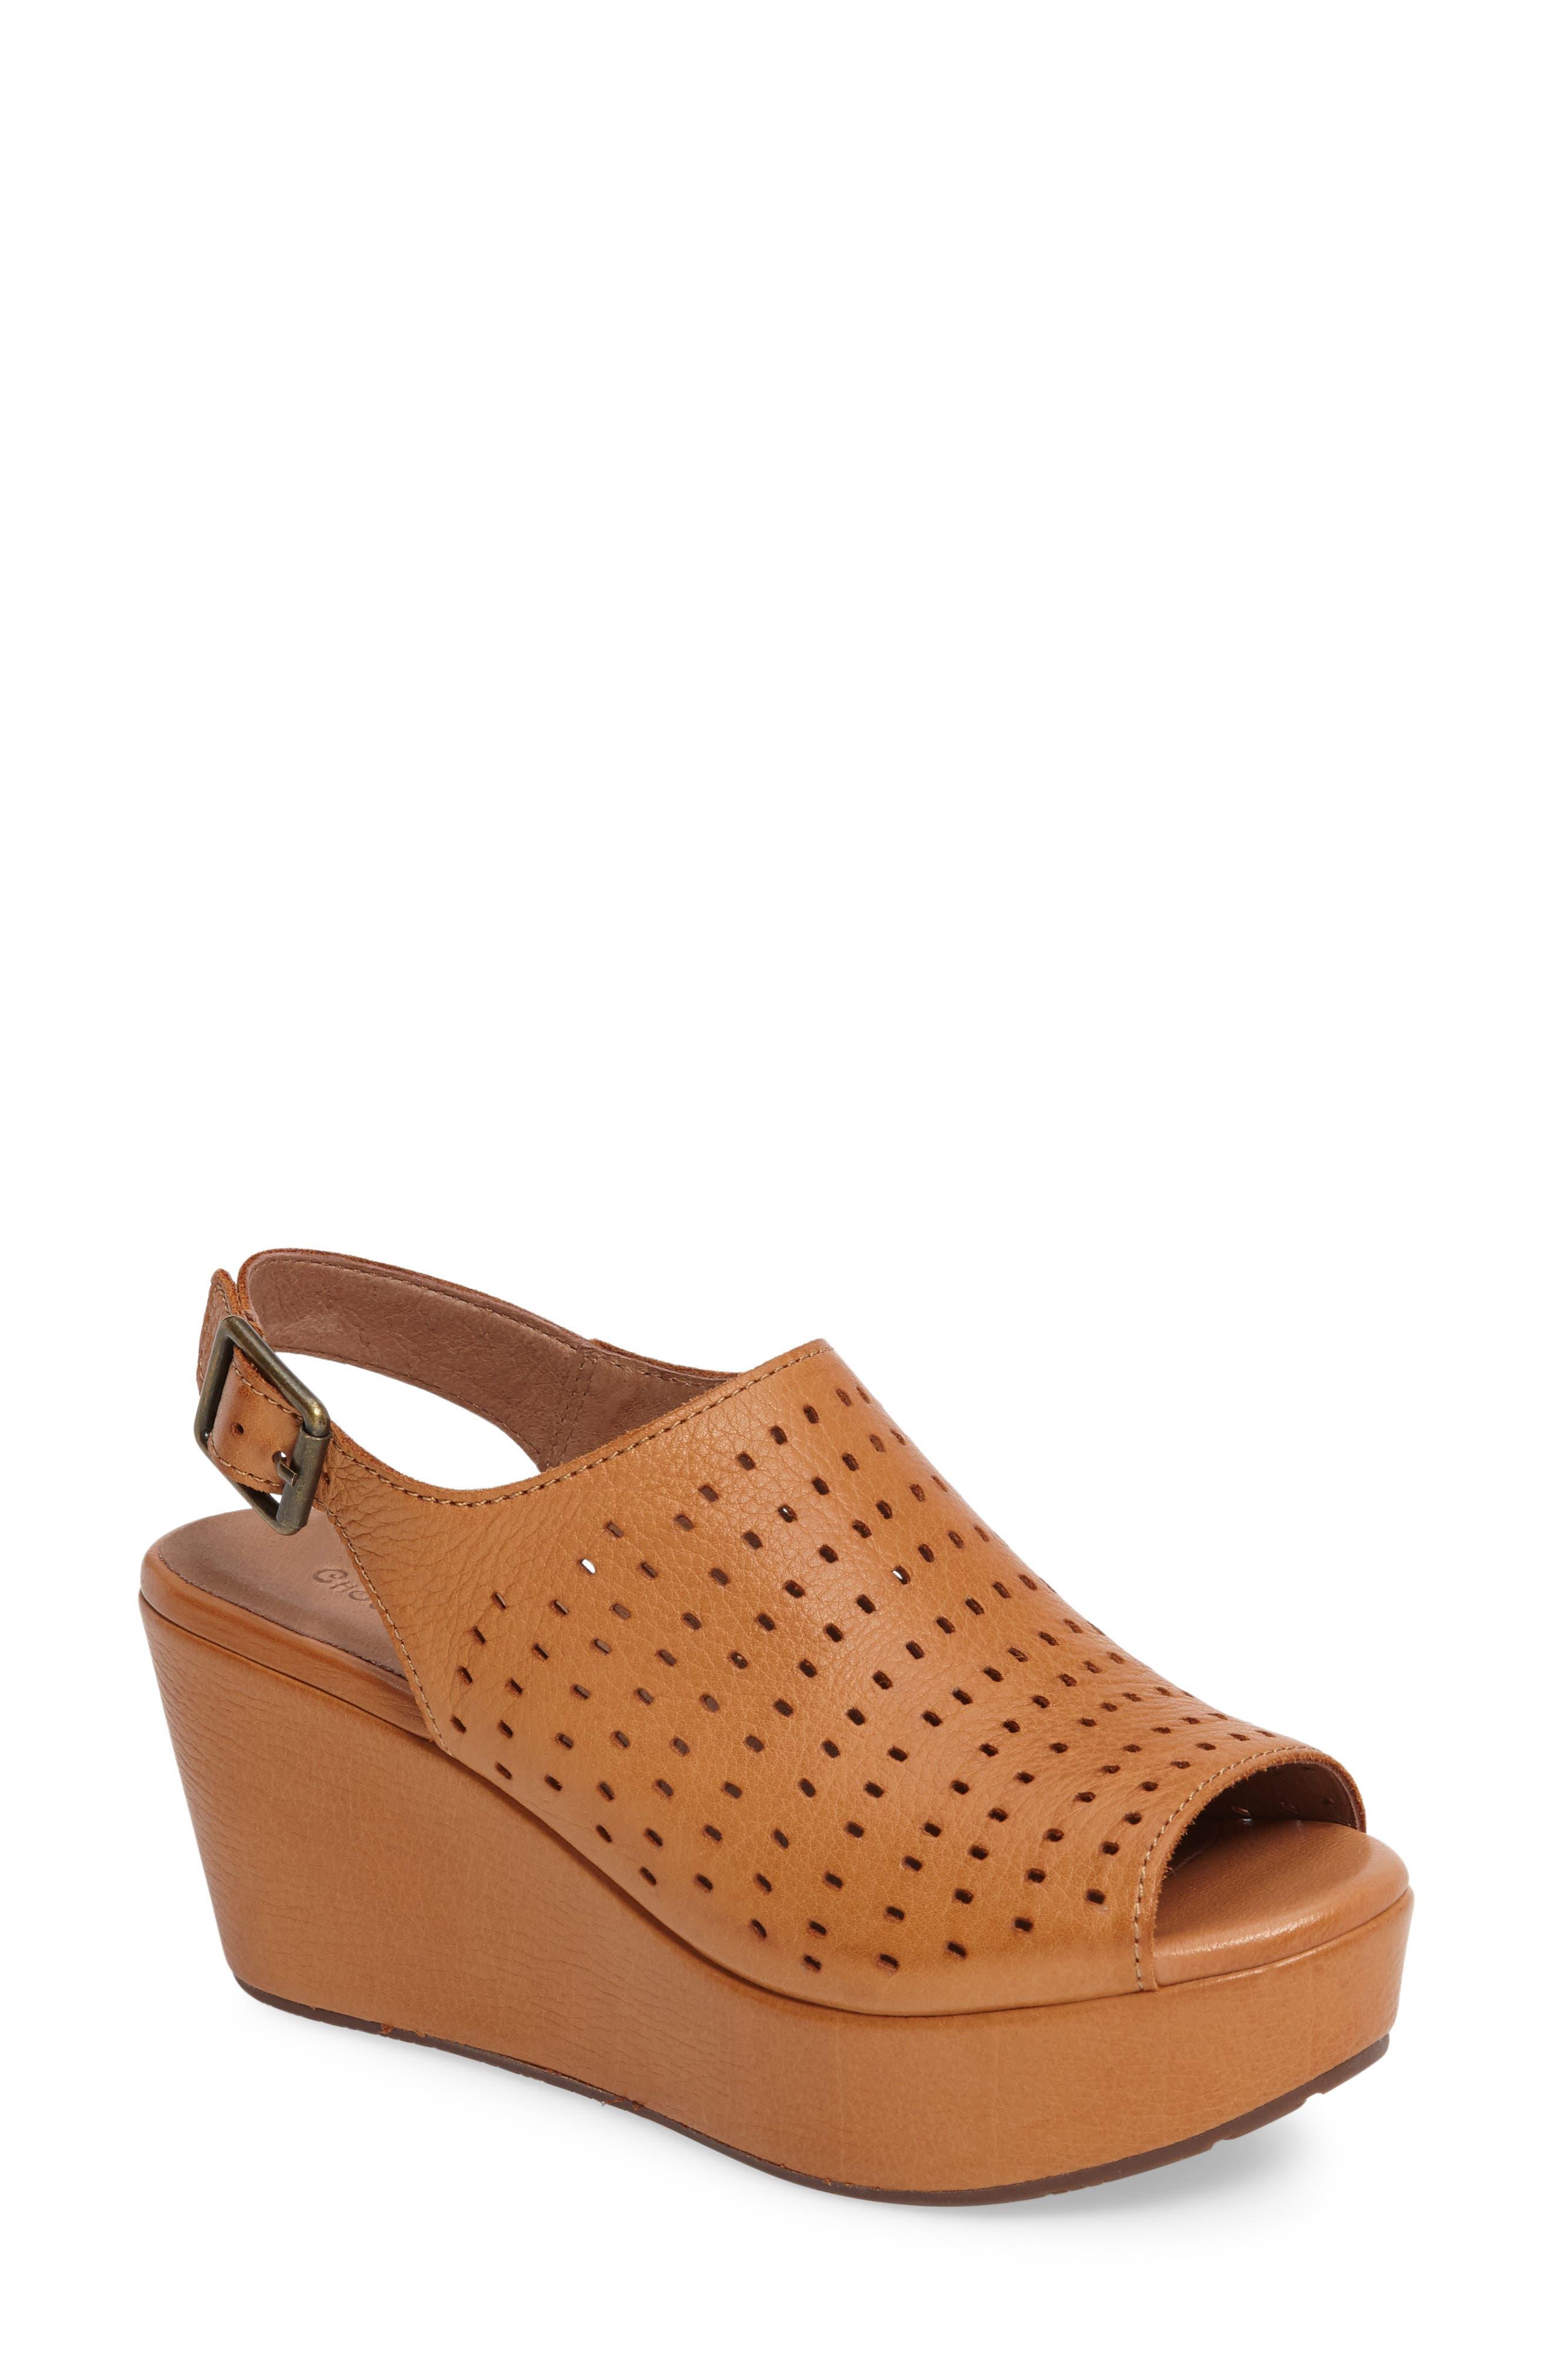 Wala Perforated Wedge Sandal,                         Main,                         color, 200